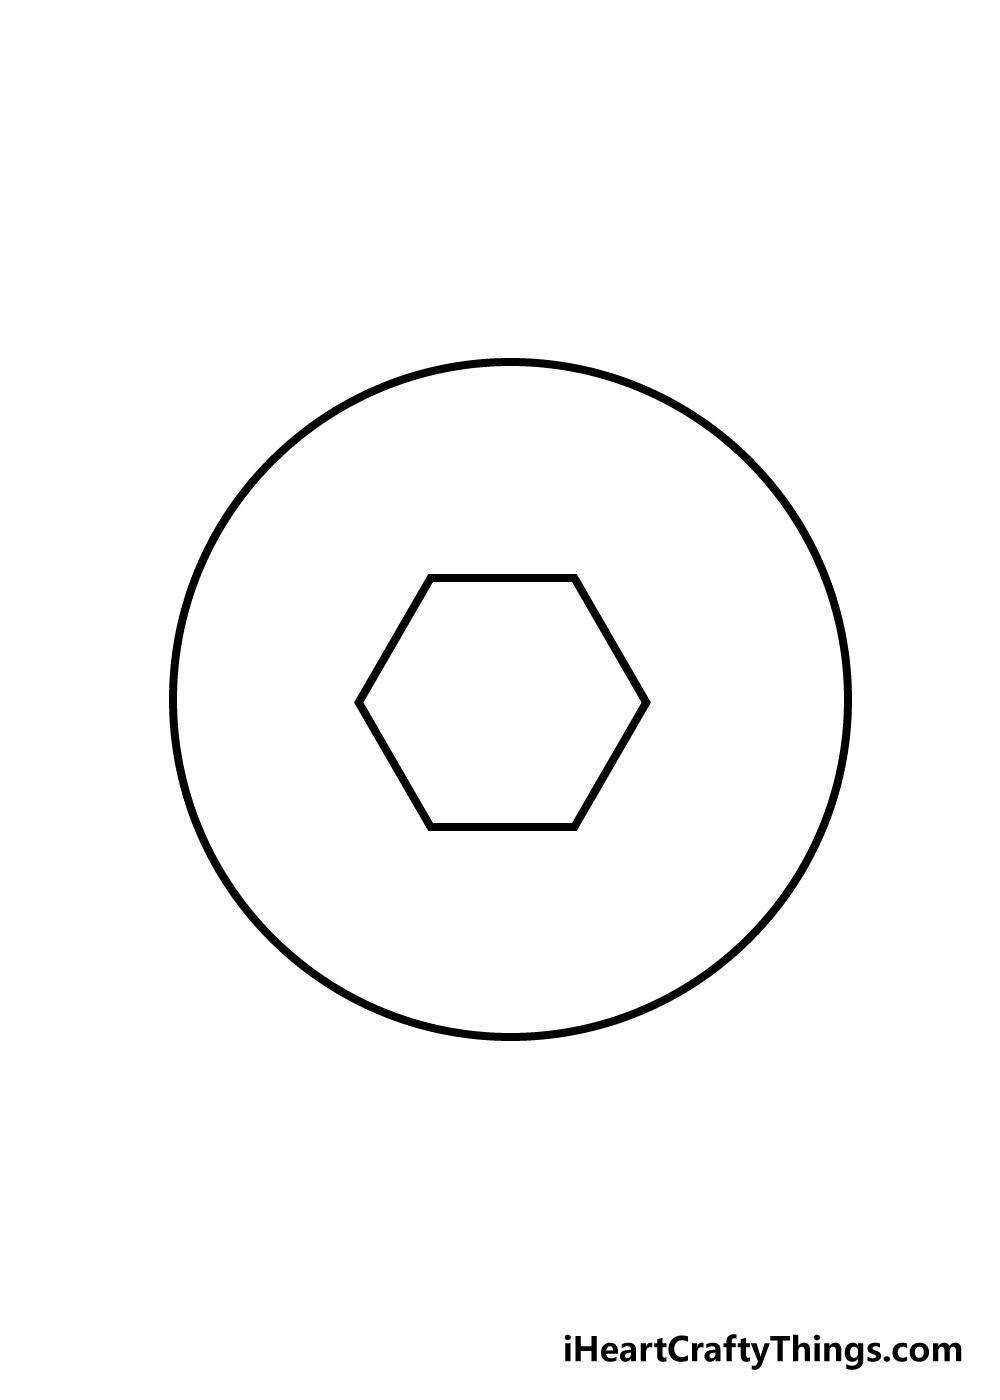 soccer ball drawing step 2